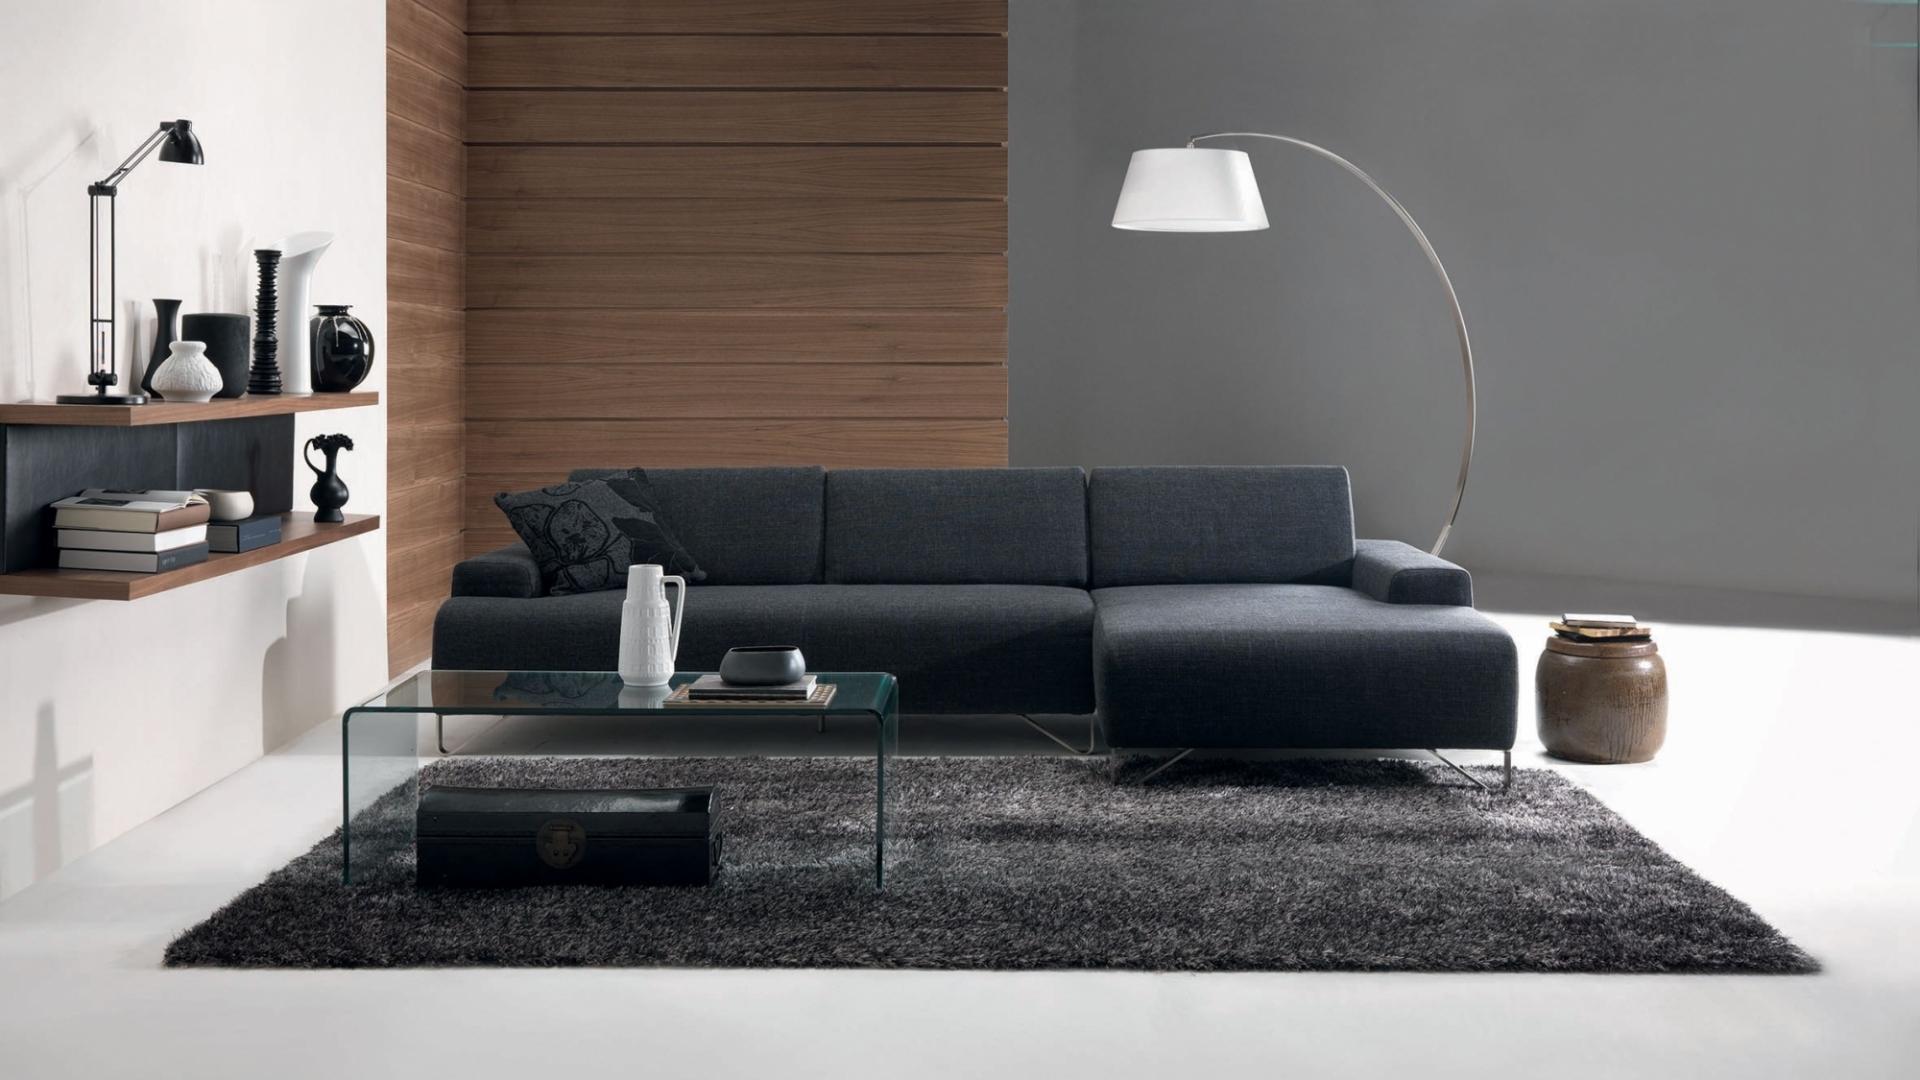 Design Bank Natuzzi.Fly 2563 Hip Furniture